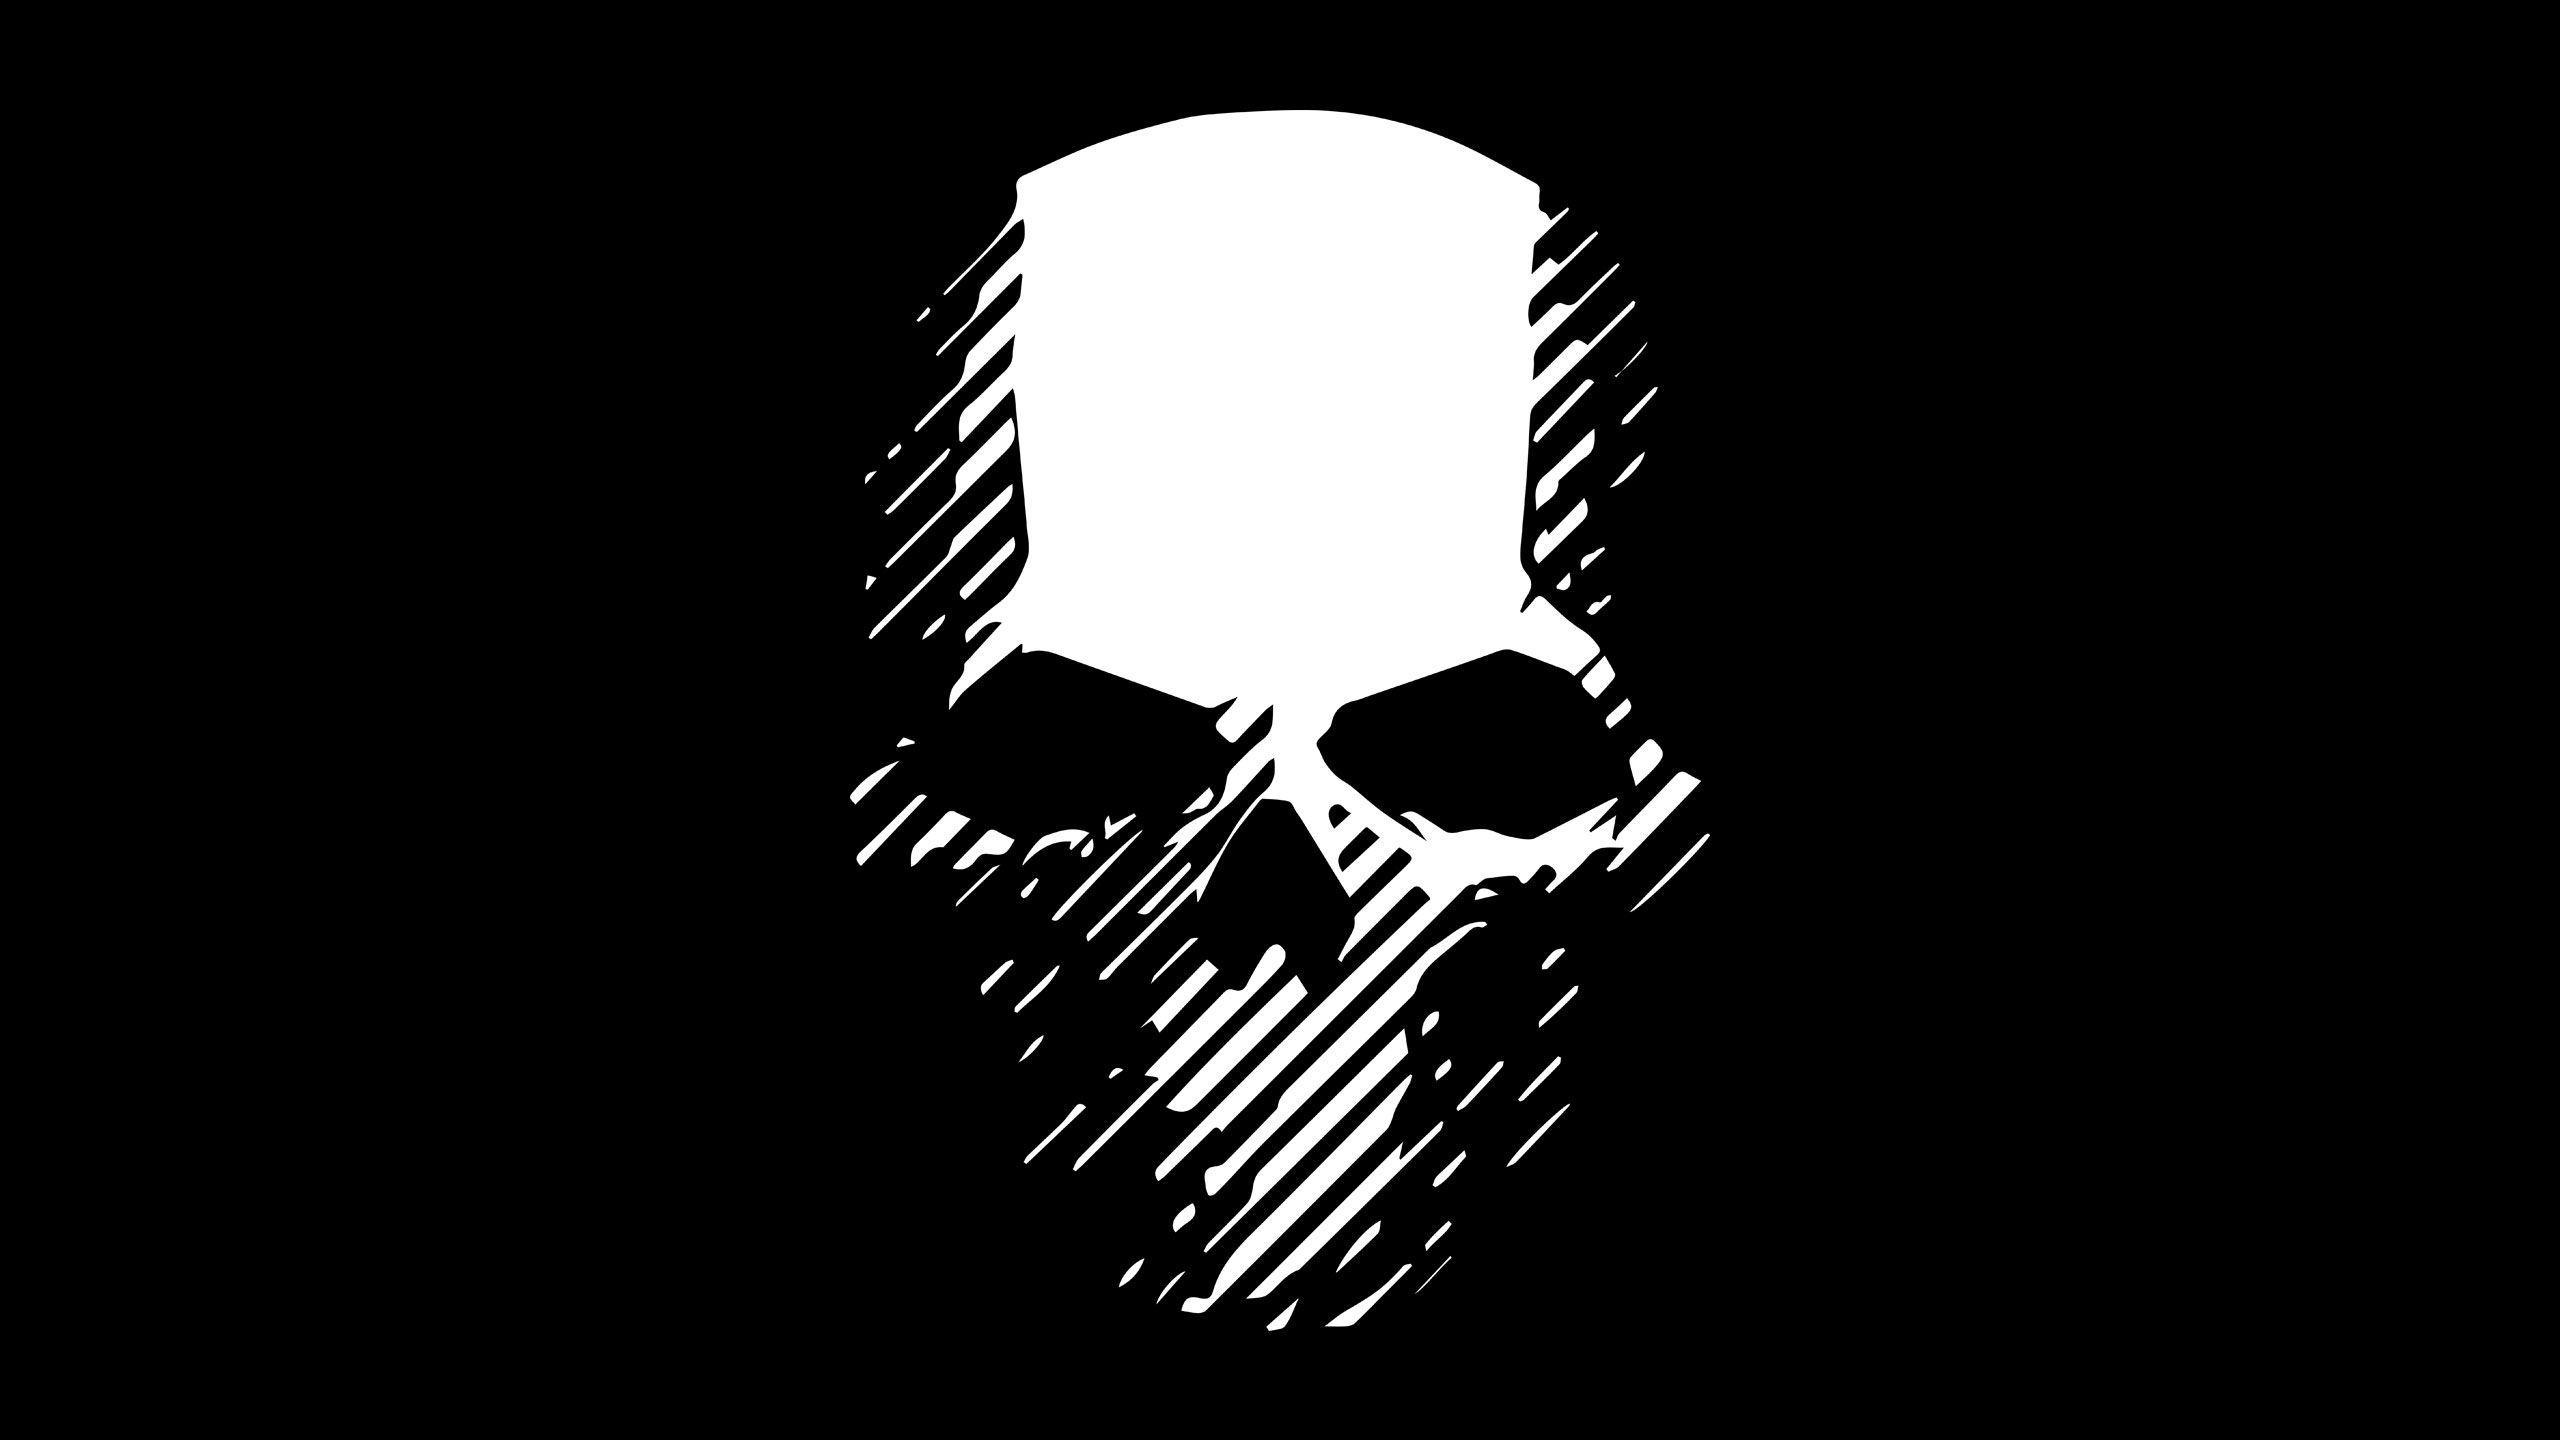 Ghost Skull Wallpapers Wallpaper Cave